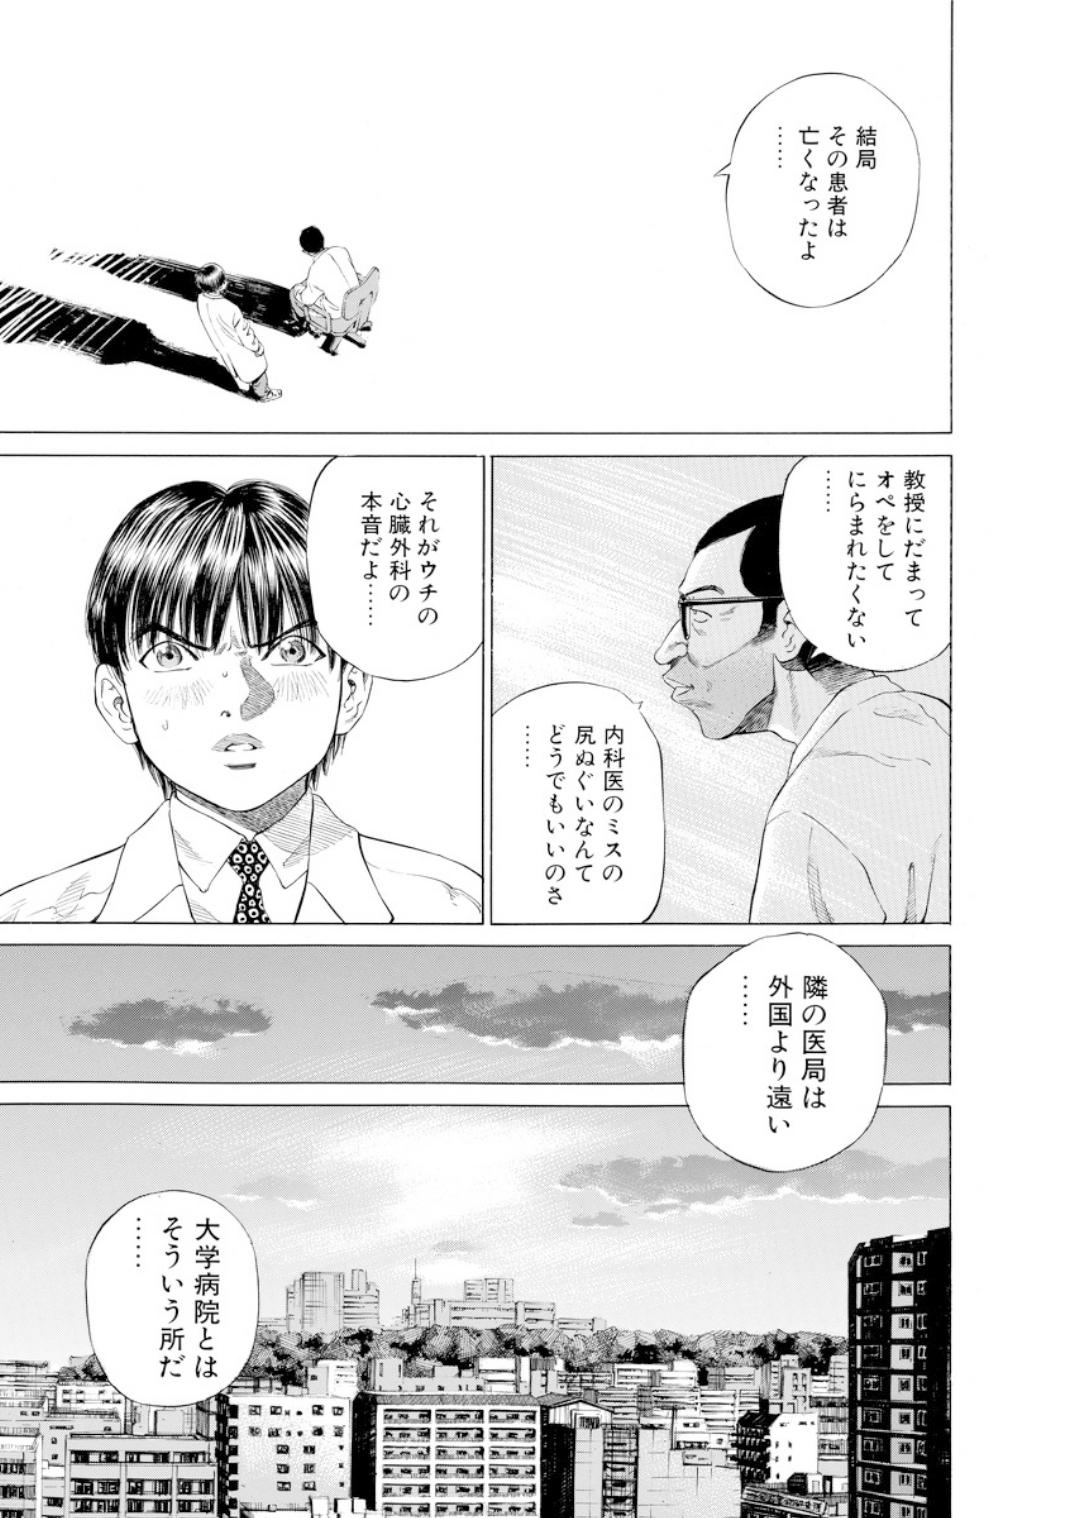 001bj_page-0175.jpg